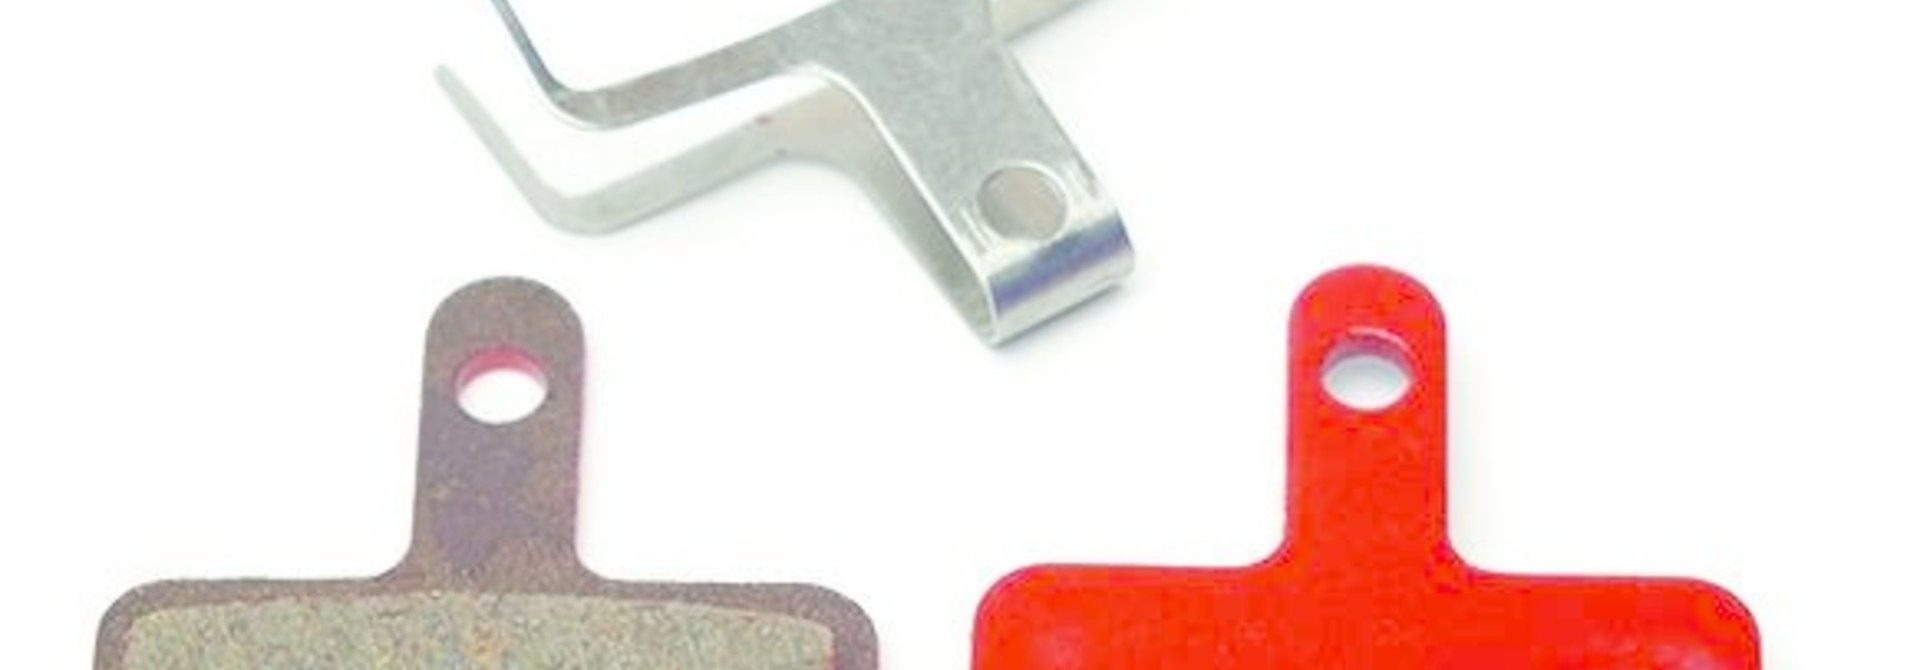 Kool-Stop Shimano Organic M575/M495 Disk Brake Pads Steel Plate #KS-D620